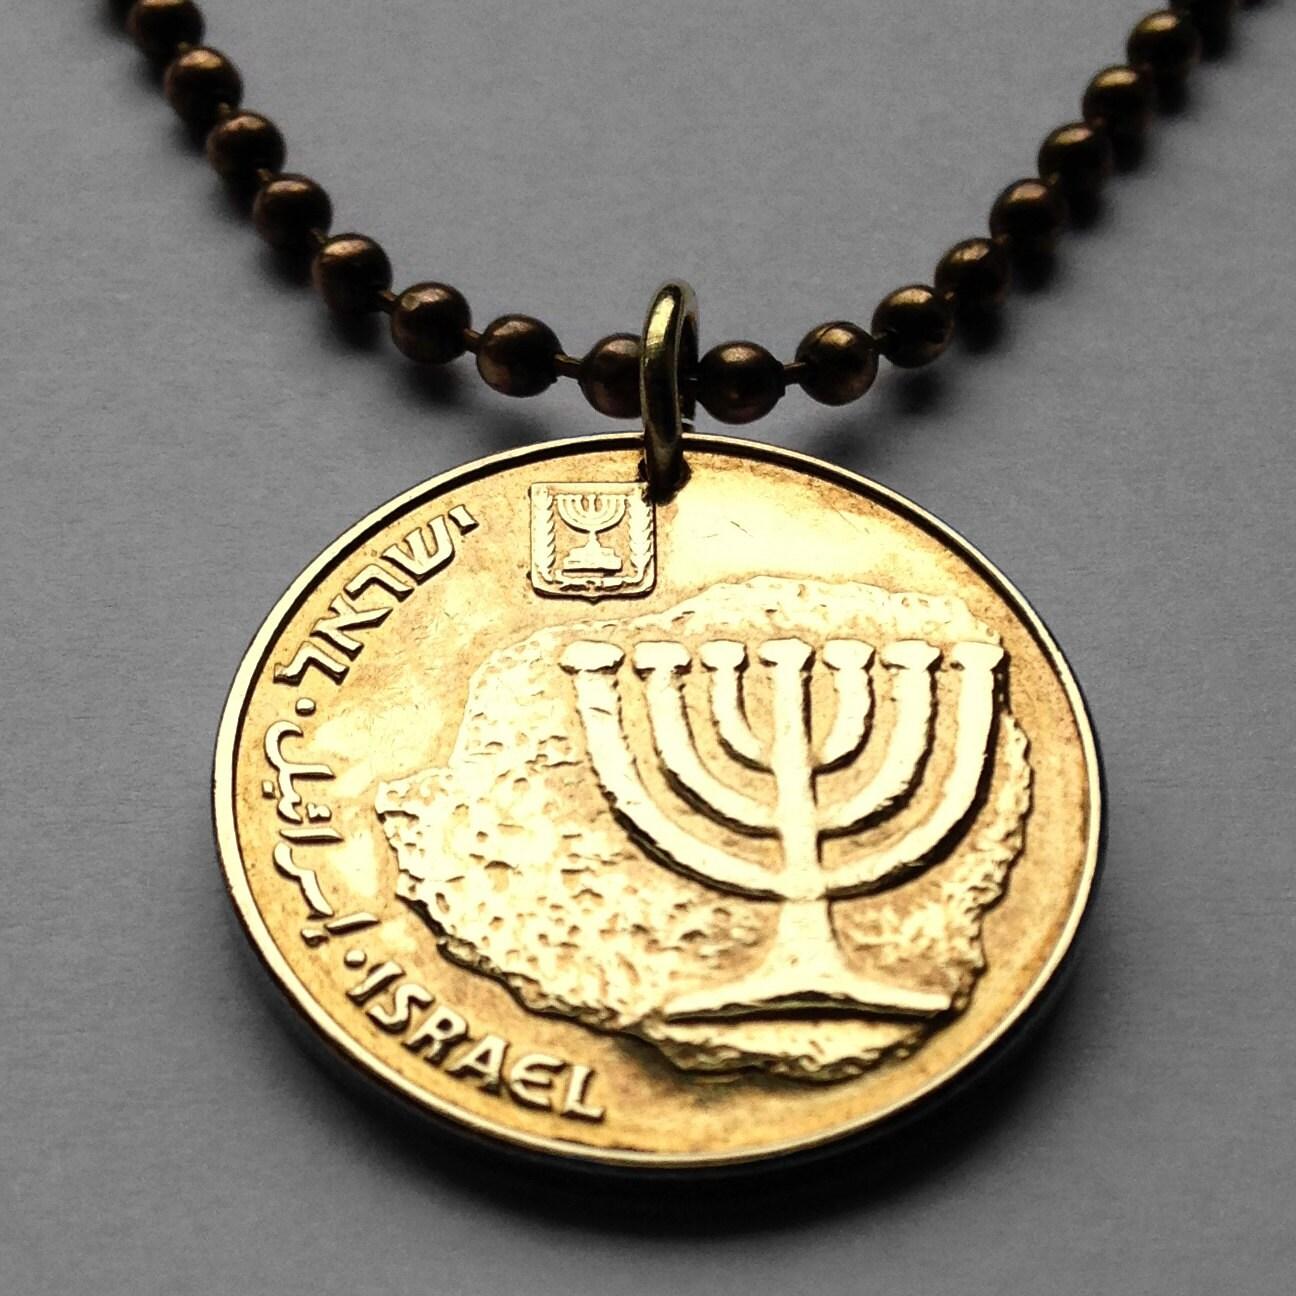 1991 O 2001 Israel 10 Agorot Coin Pendant Jewish Menorah # Muebles Lira Gold